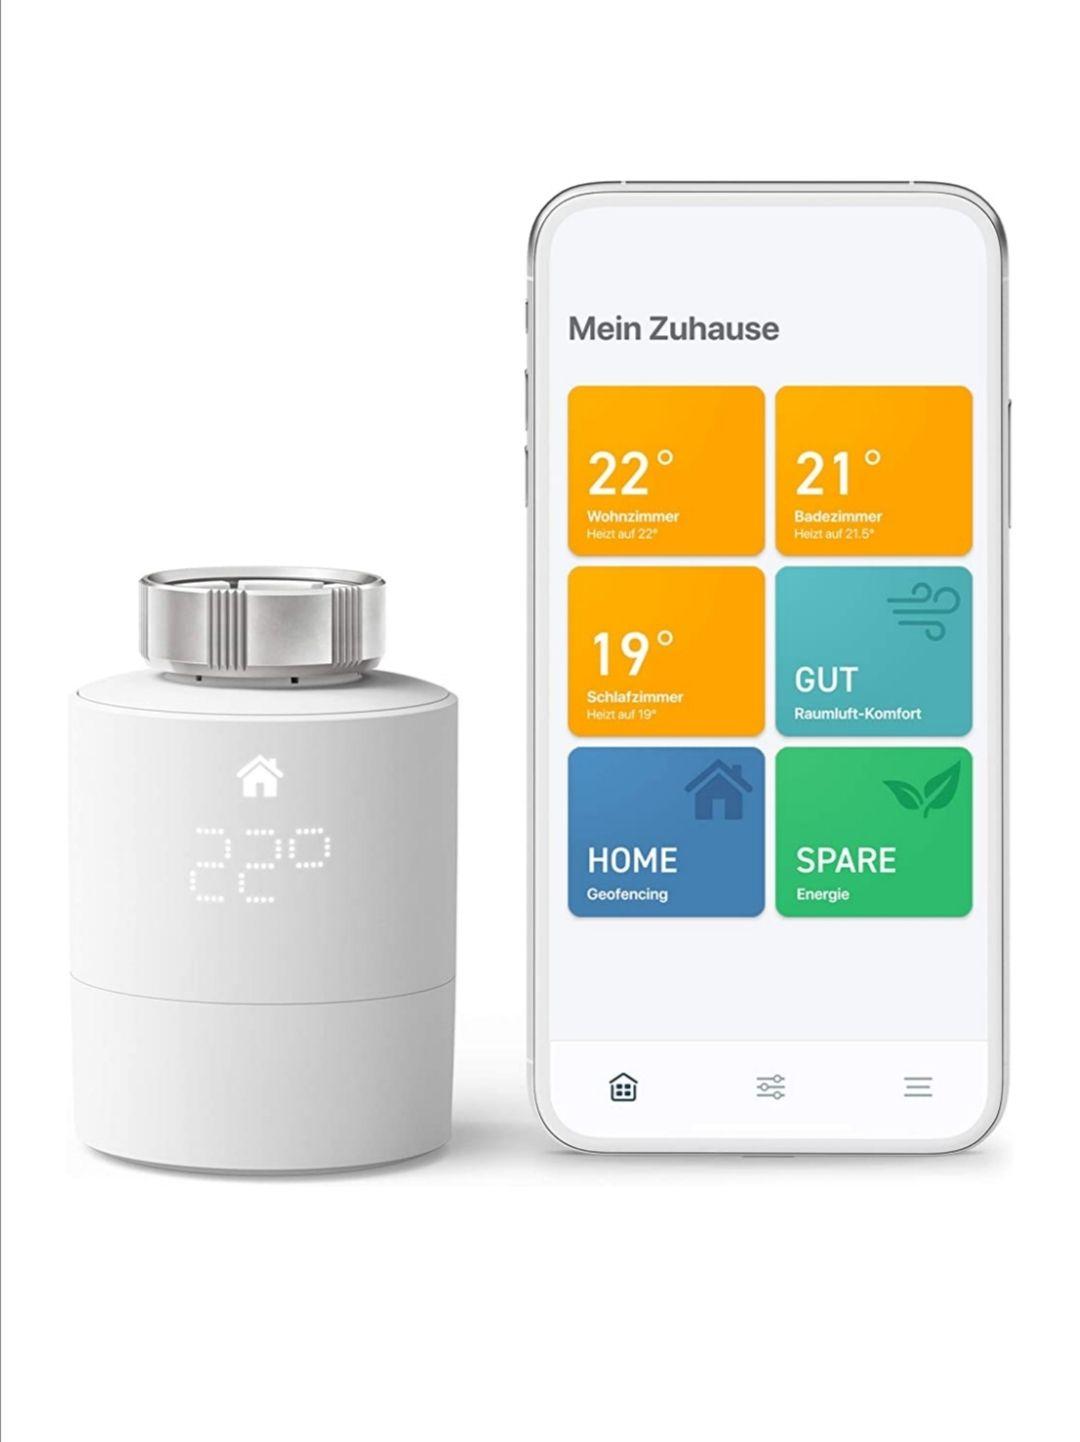 [Prime] Tado smartes Thermostat Starterkit für 74,90 (ohne Prime zzgl. Vsk.)